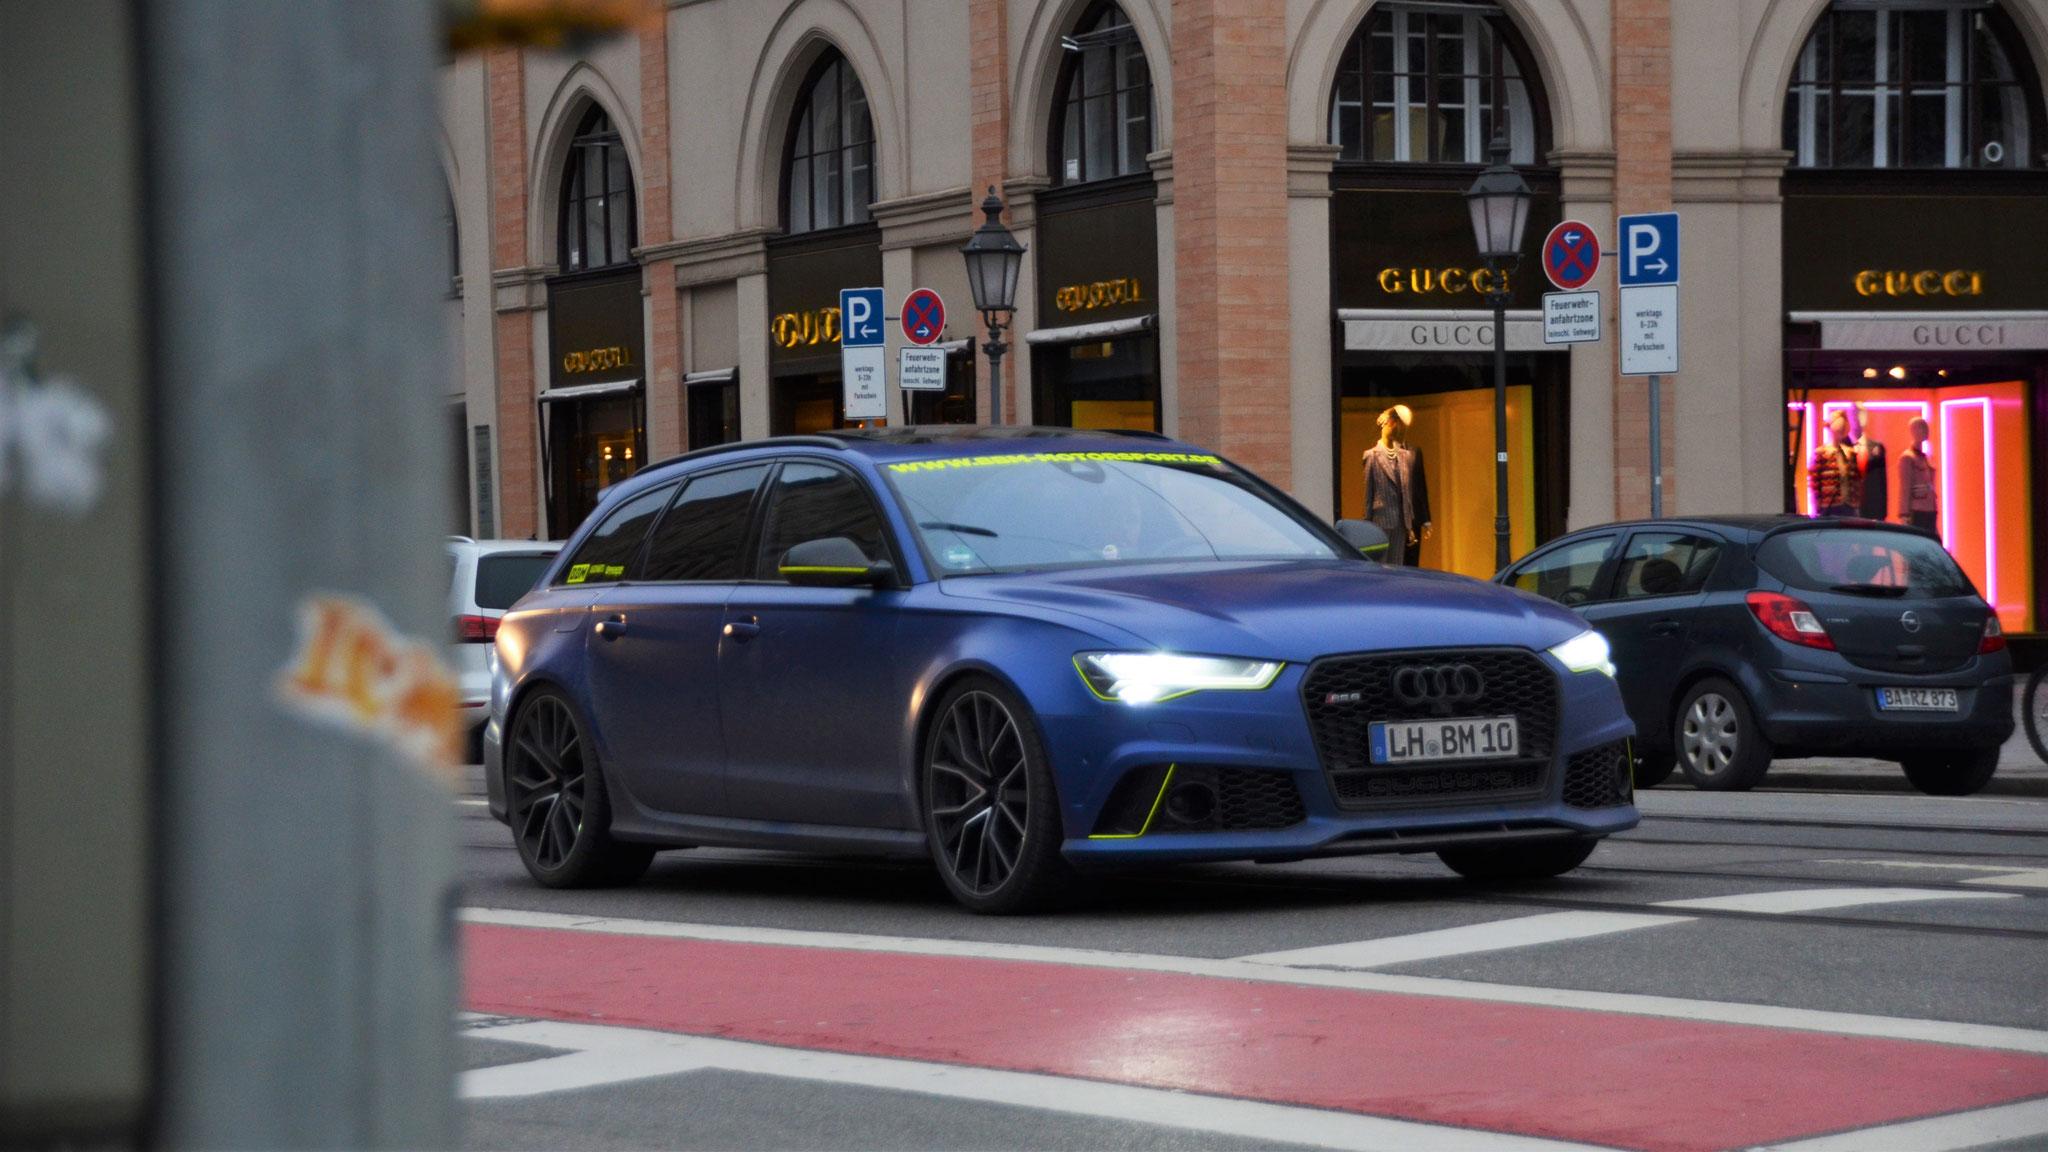 Audi RS6 - LM-BM-10